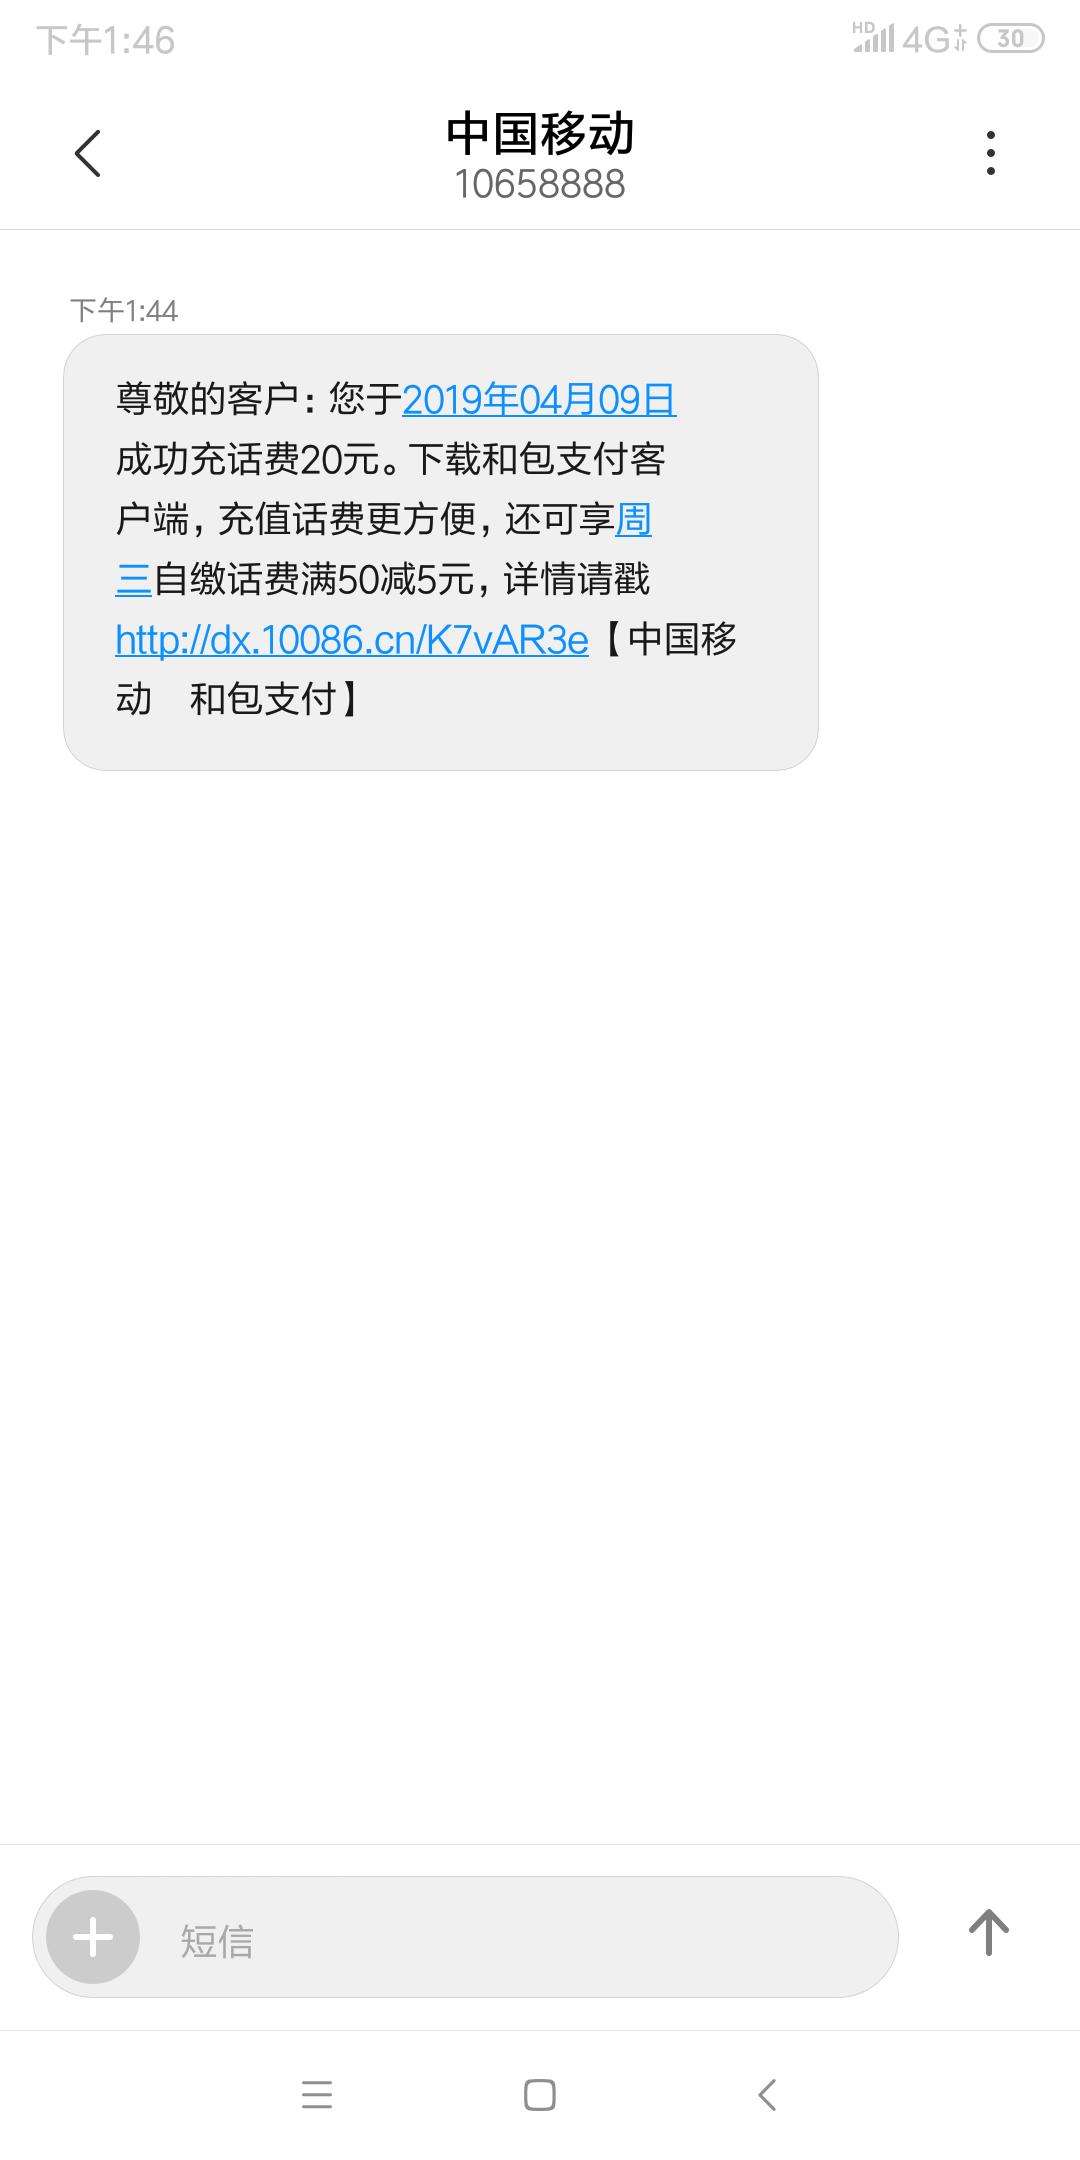 3764_1347280screenshot_2019-04-09-13-46-10-116_com.android.mms.png